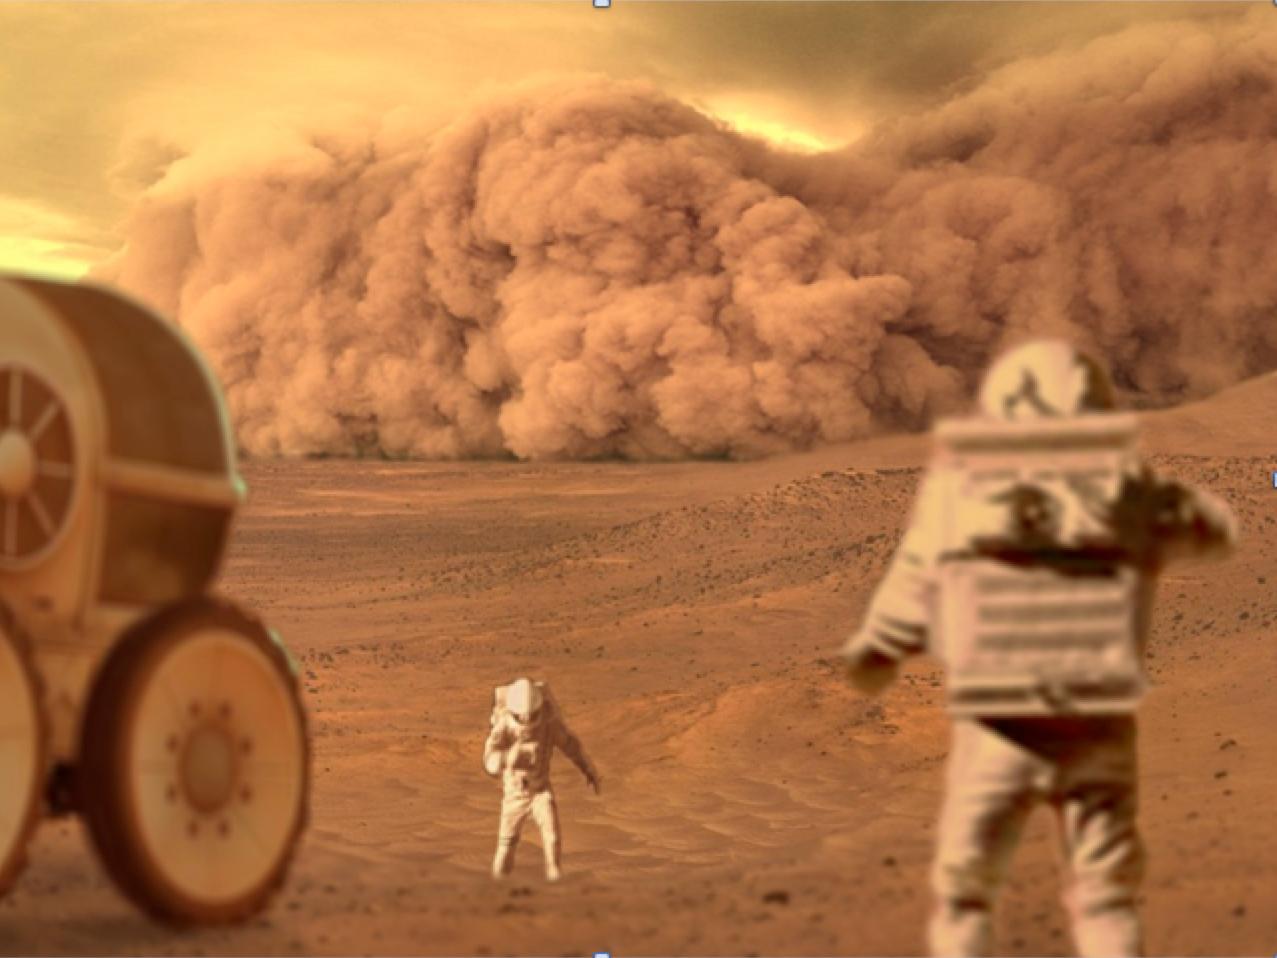 'The Martian' dust storm